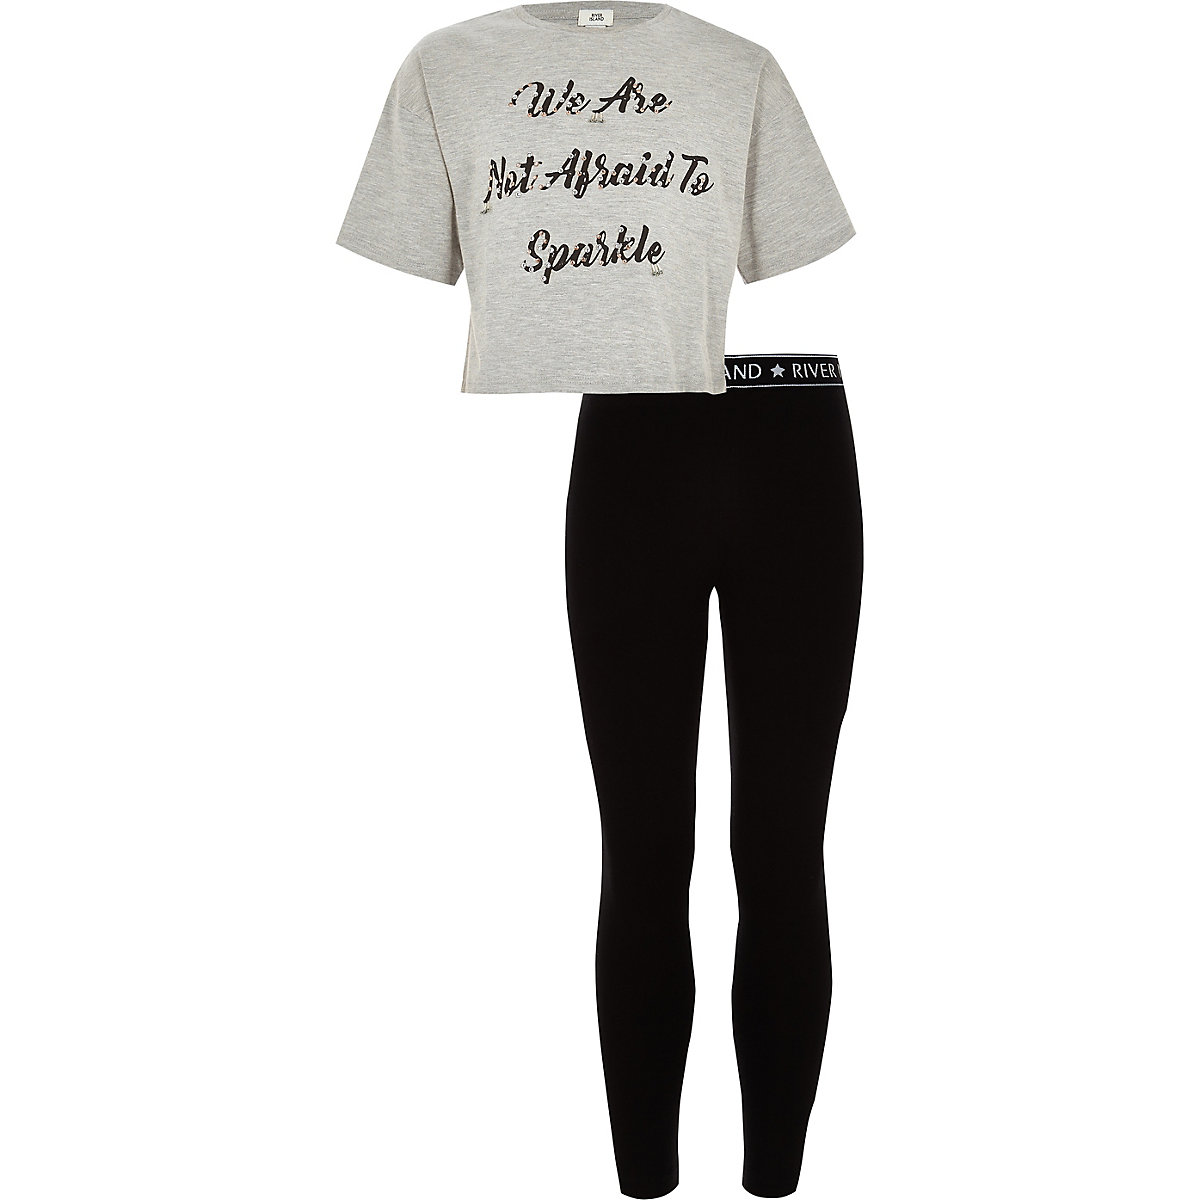 Girls grey 'not afraid' T-shirt  outfit